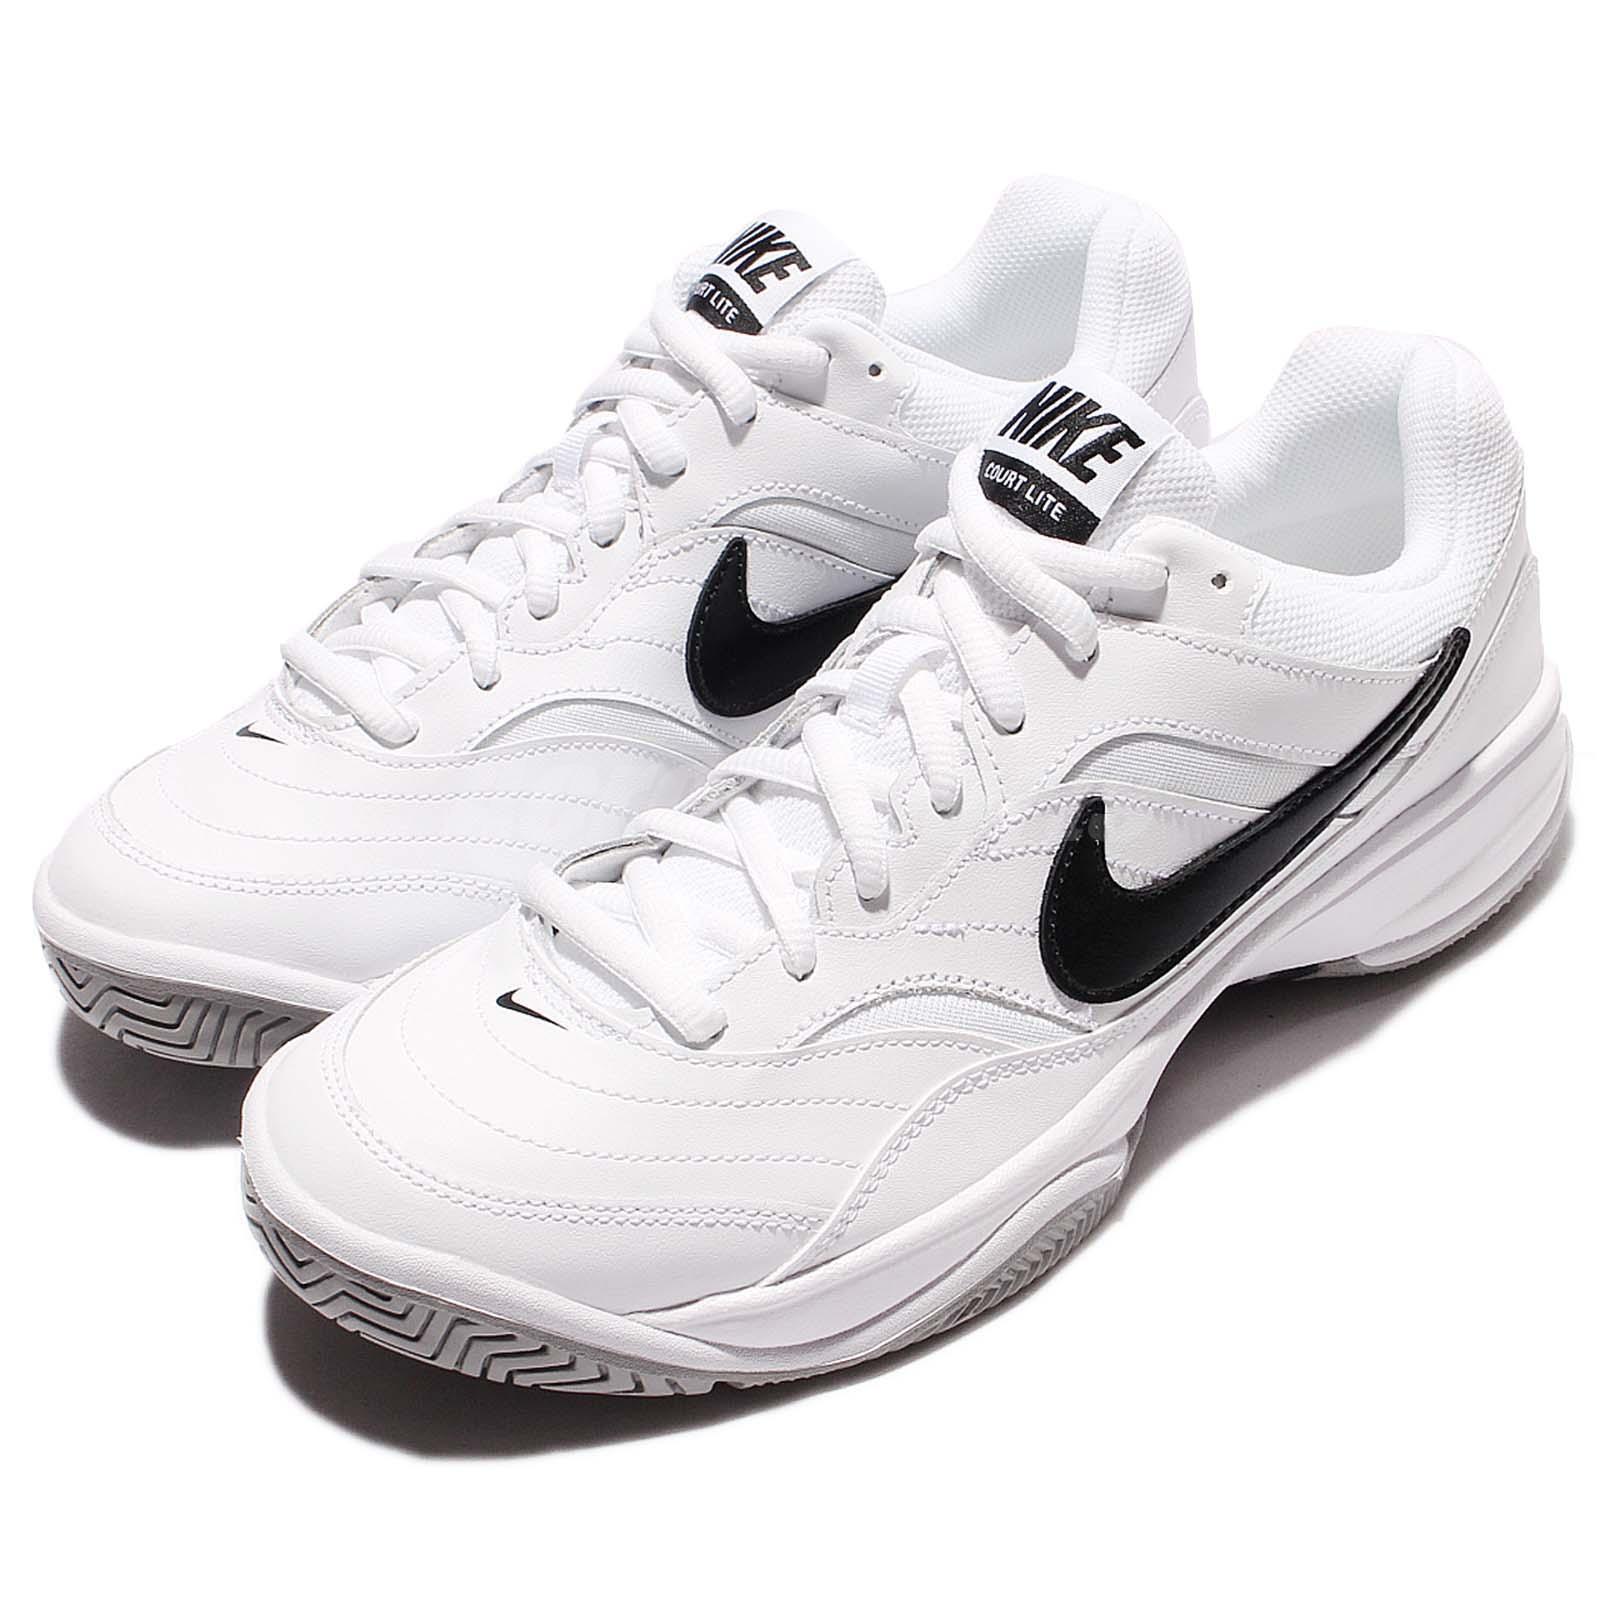 Nike Court Lite chaussures blanc noir homme Tennis chaussures Lite Baskets Trainers 845021-100 6a15ac